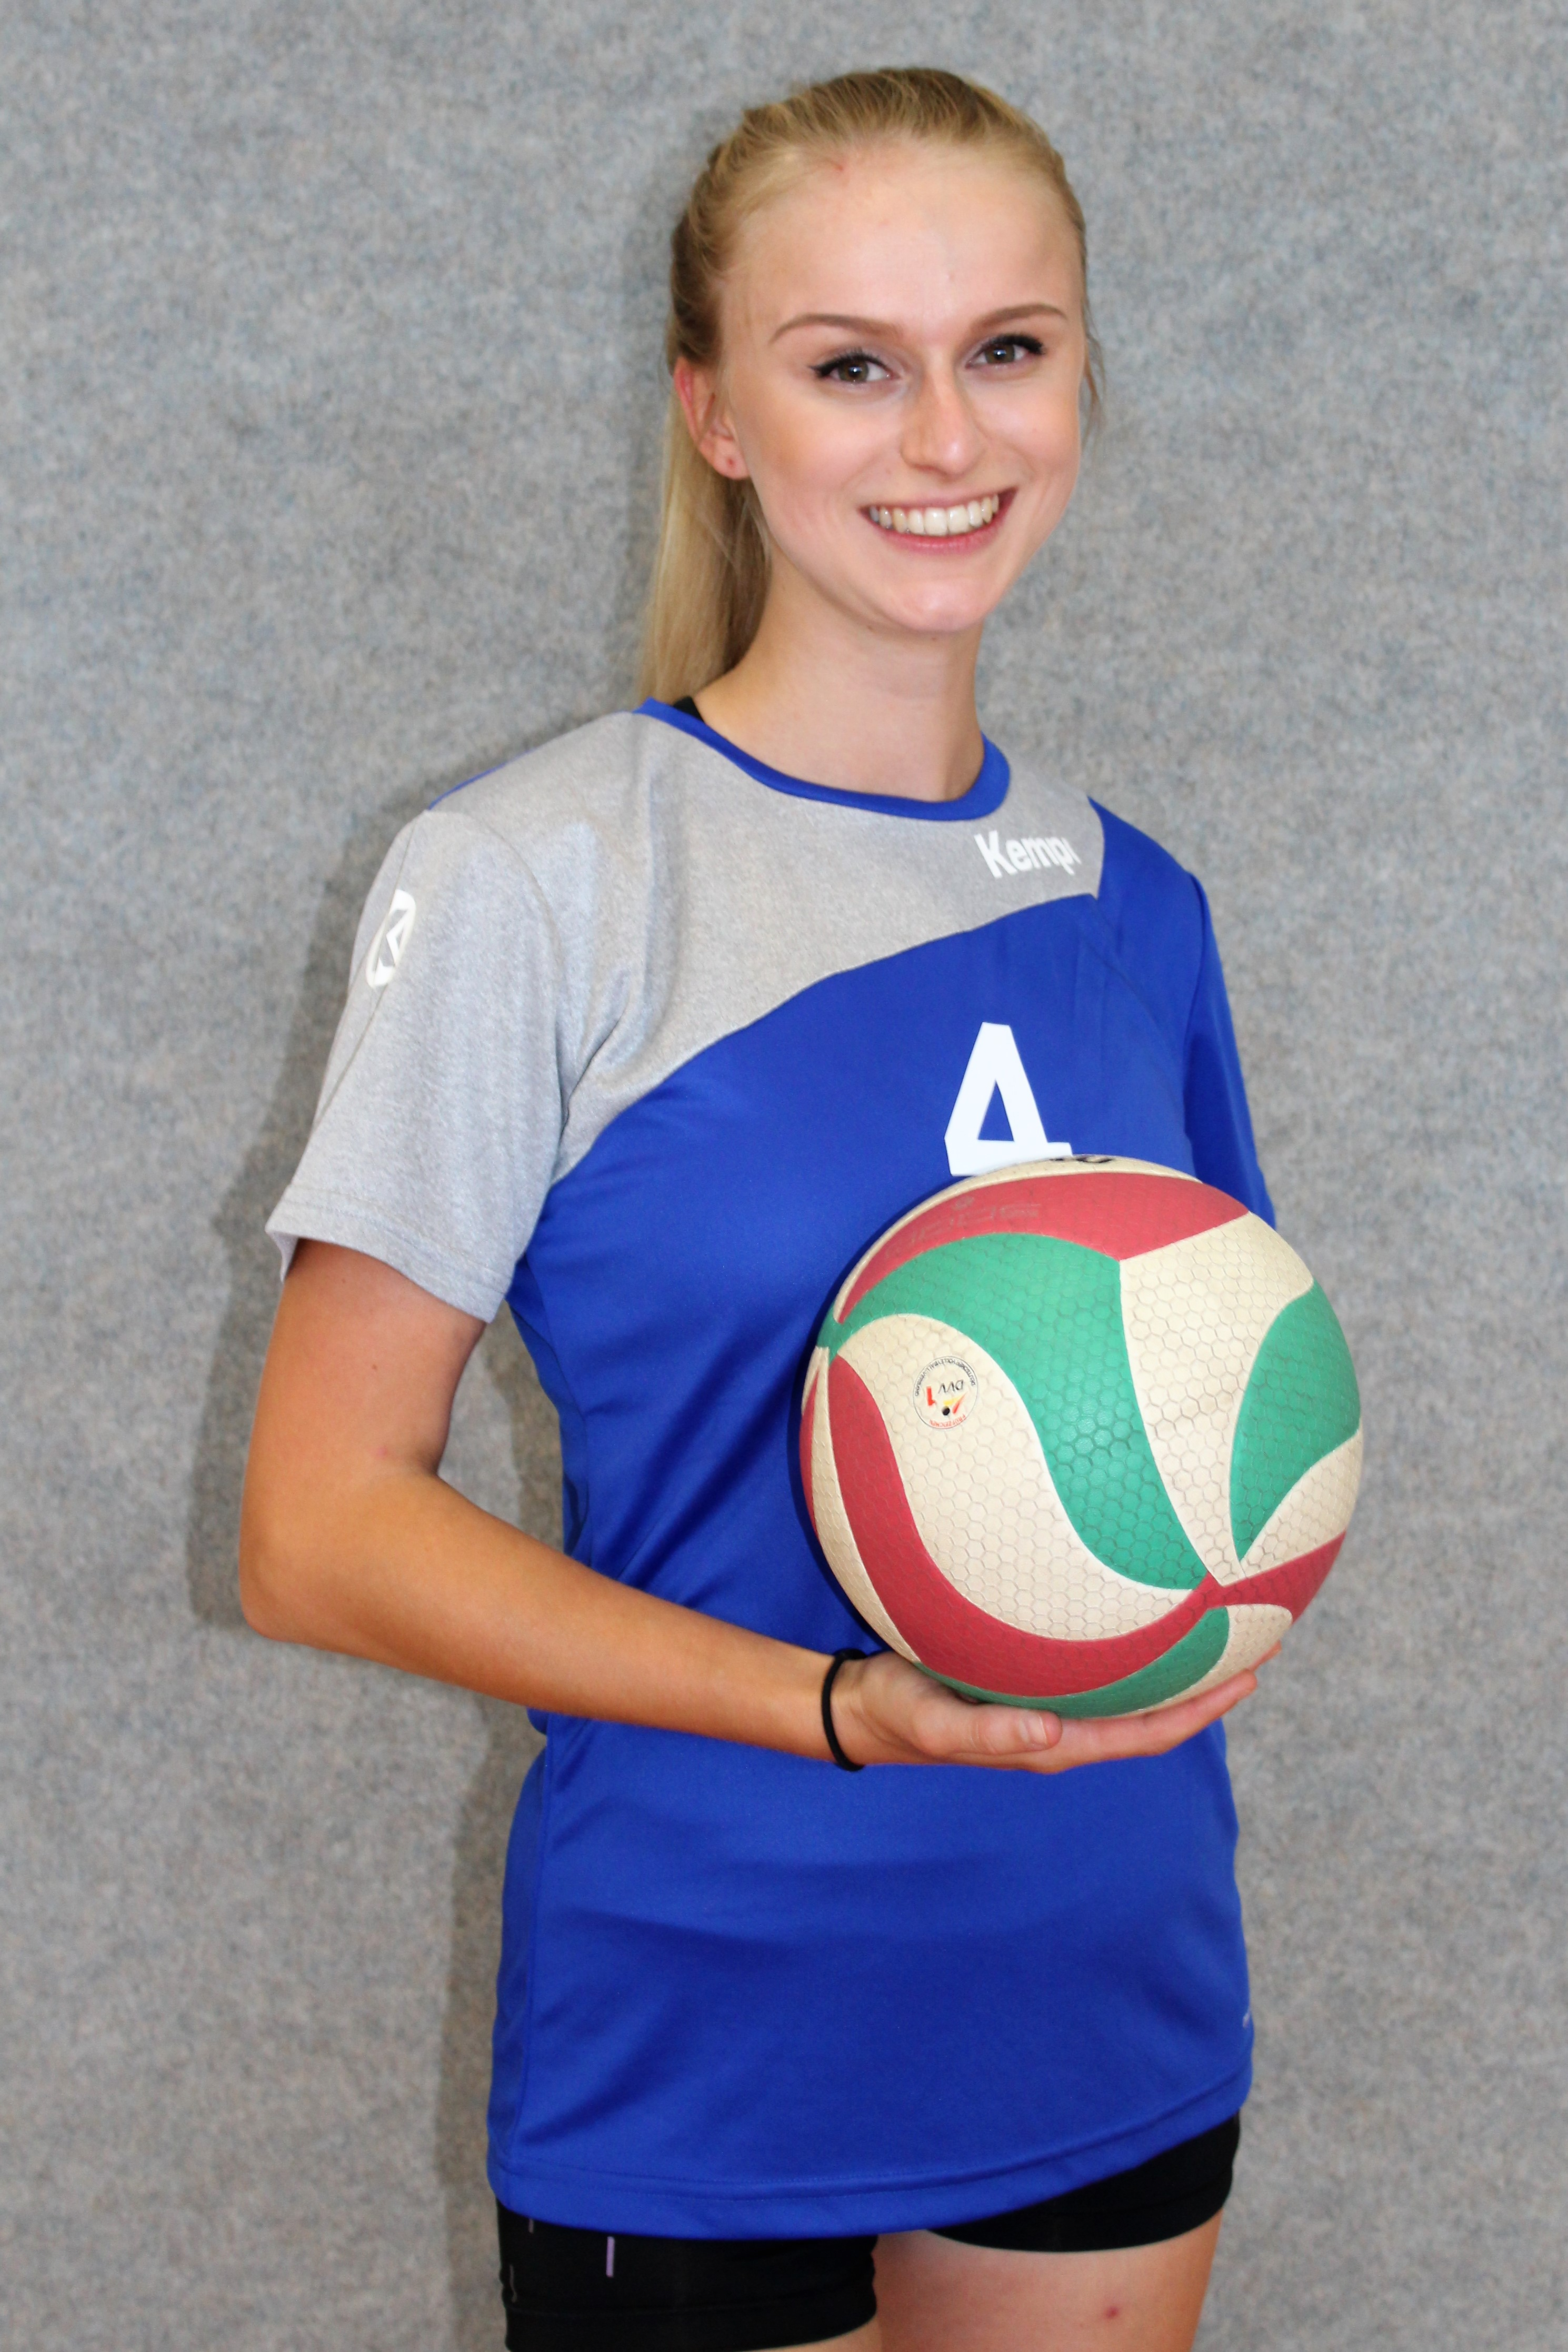 Annette Stephan Trikotnummer: 4 Position: Außen - Annahme / Diagonal Größe: 1,64 m